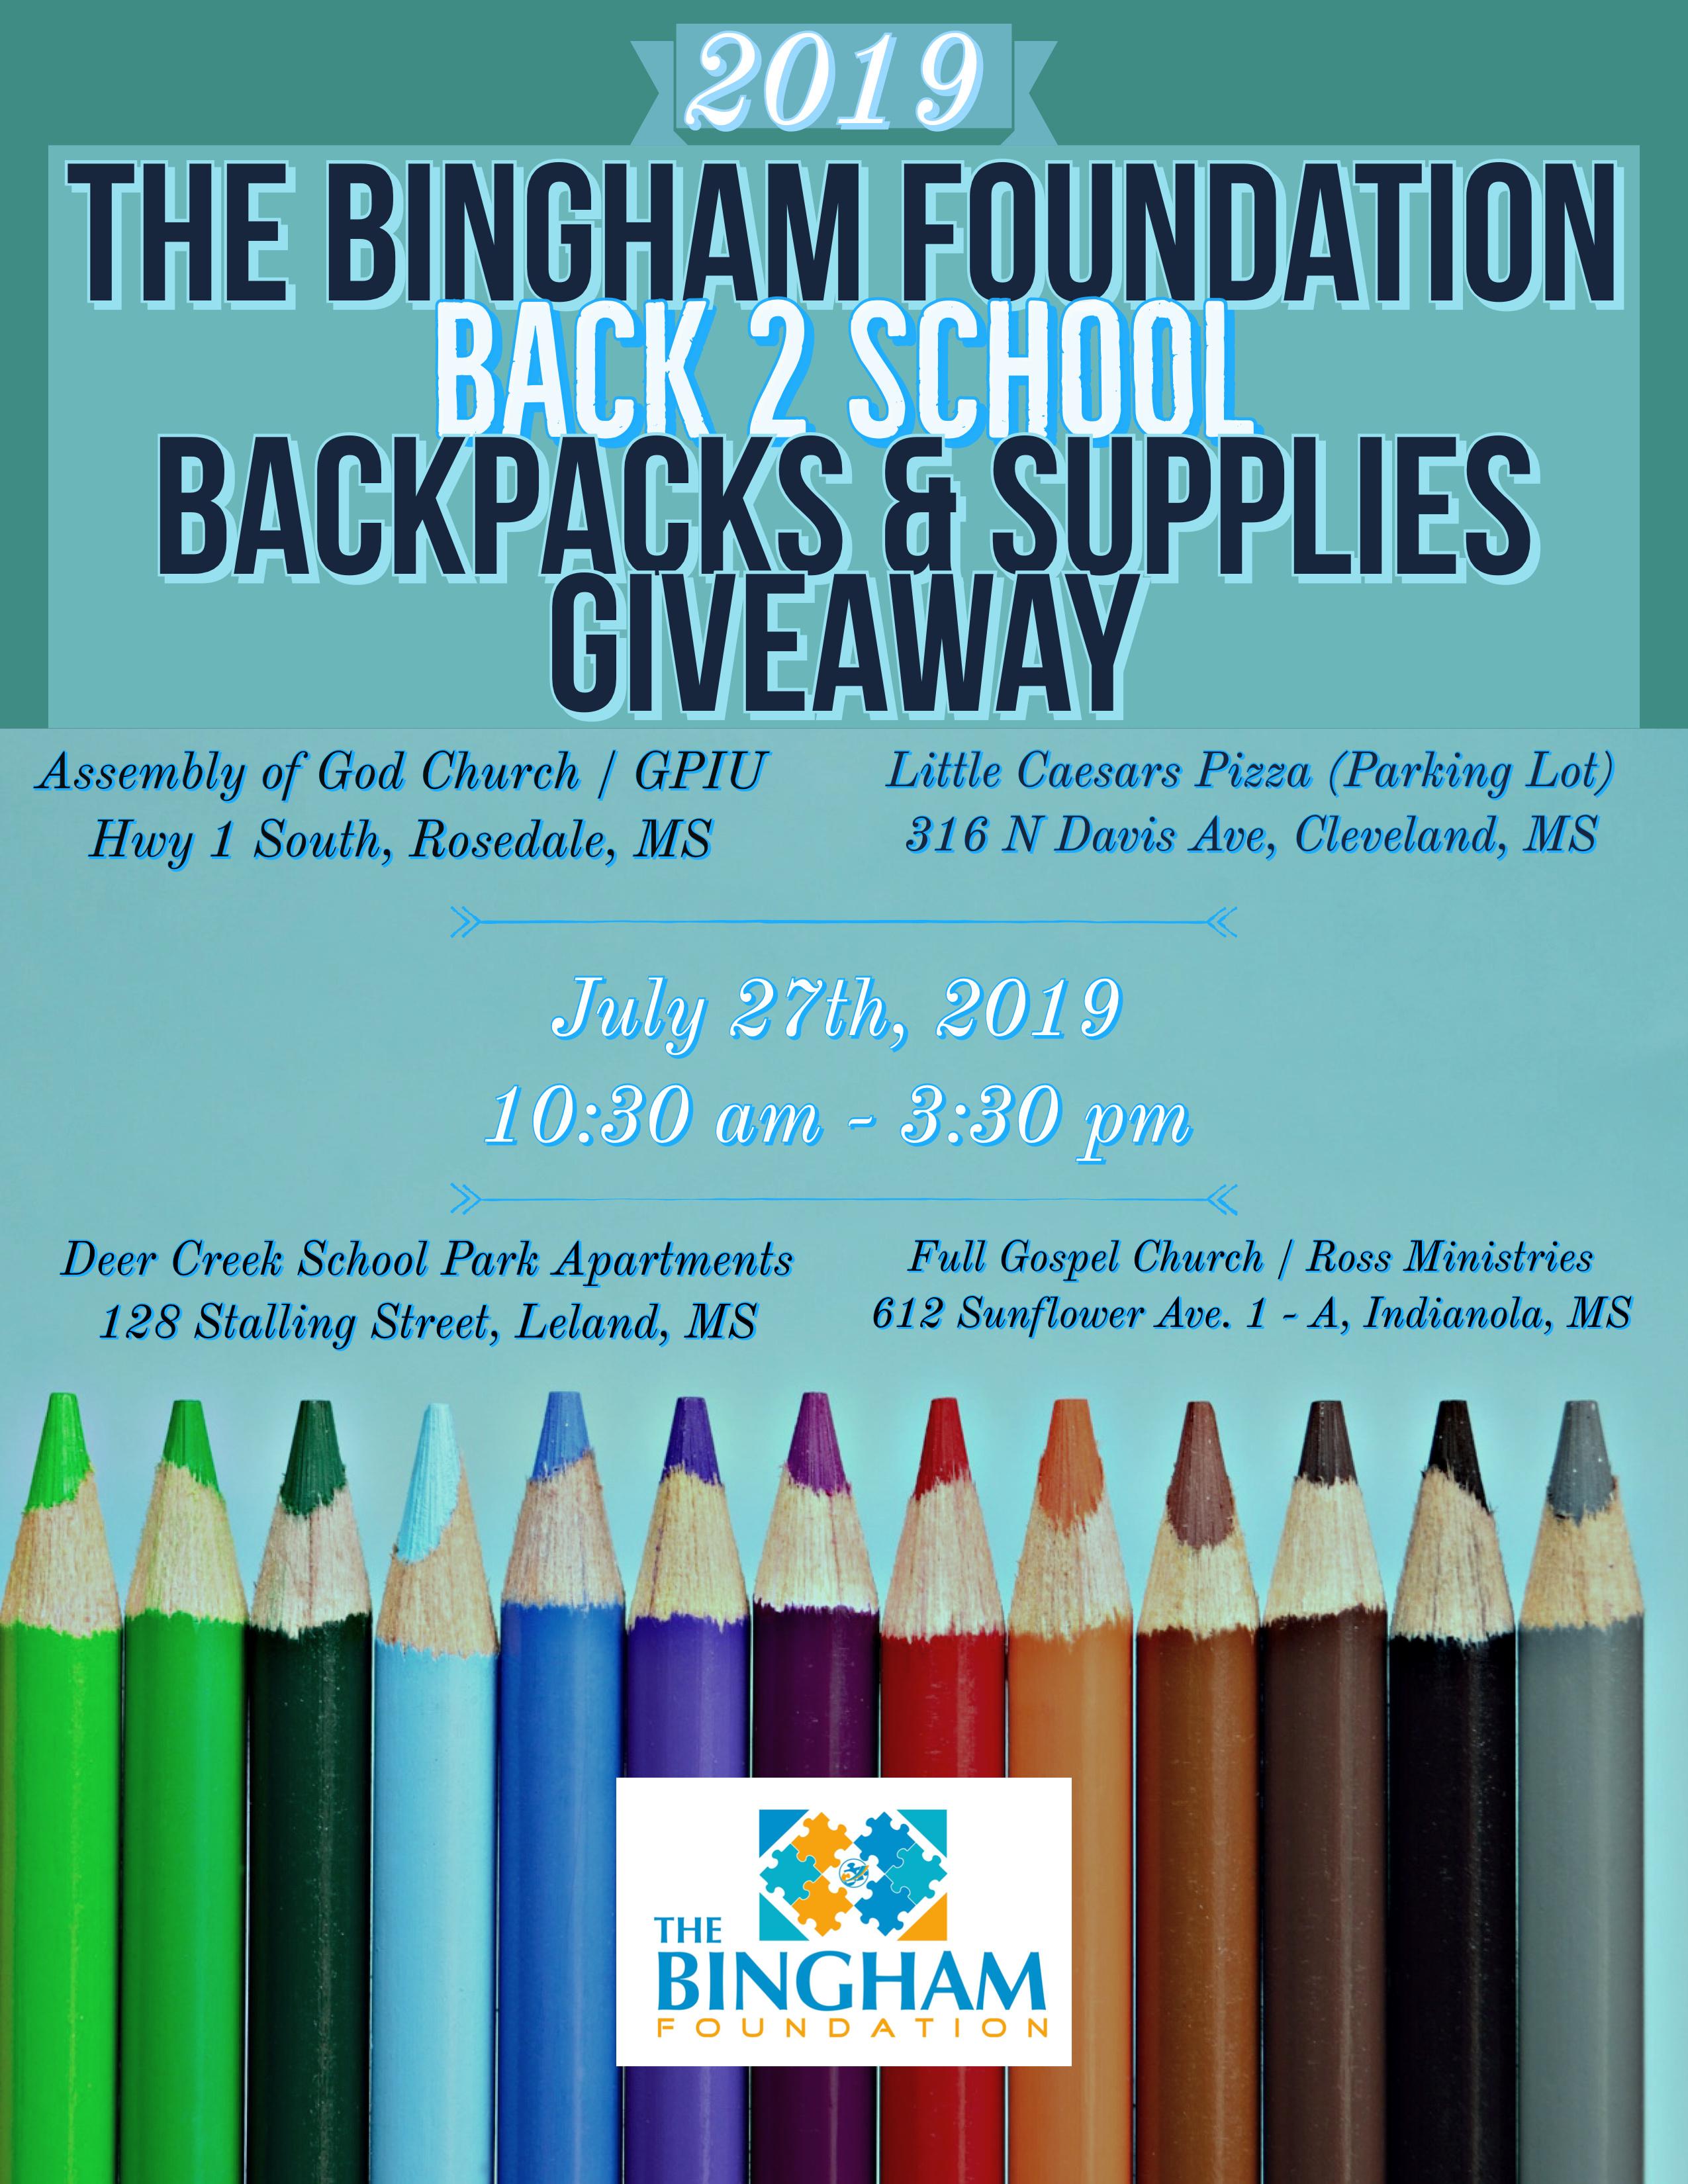 2019 Back 2 School Backpacks Giveaway